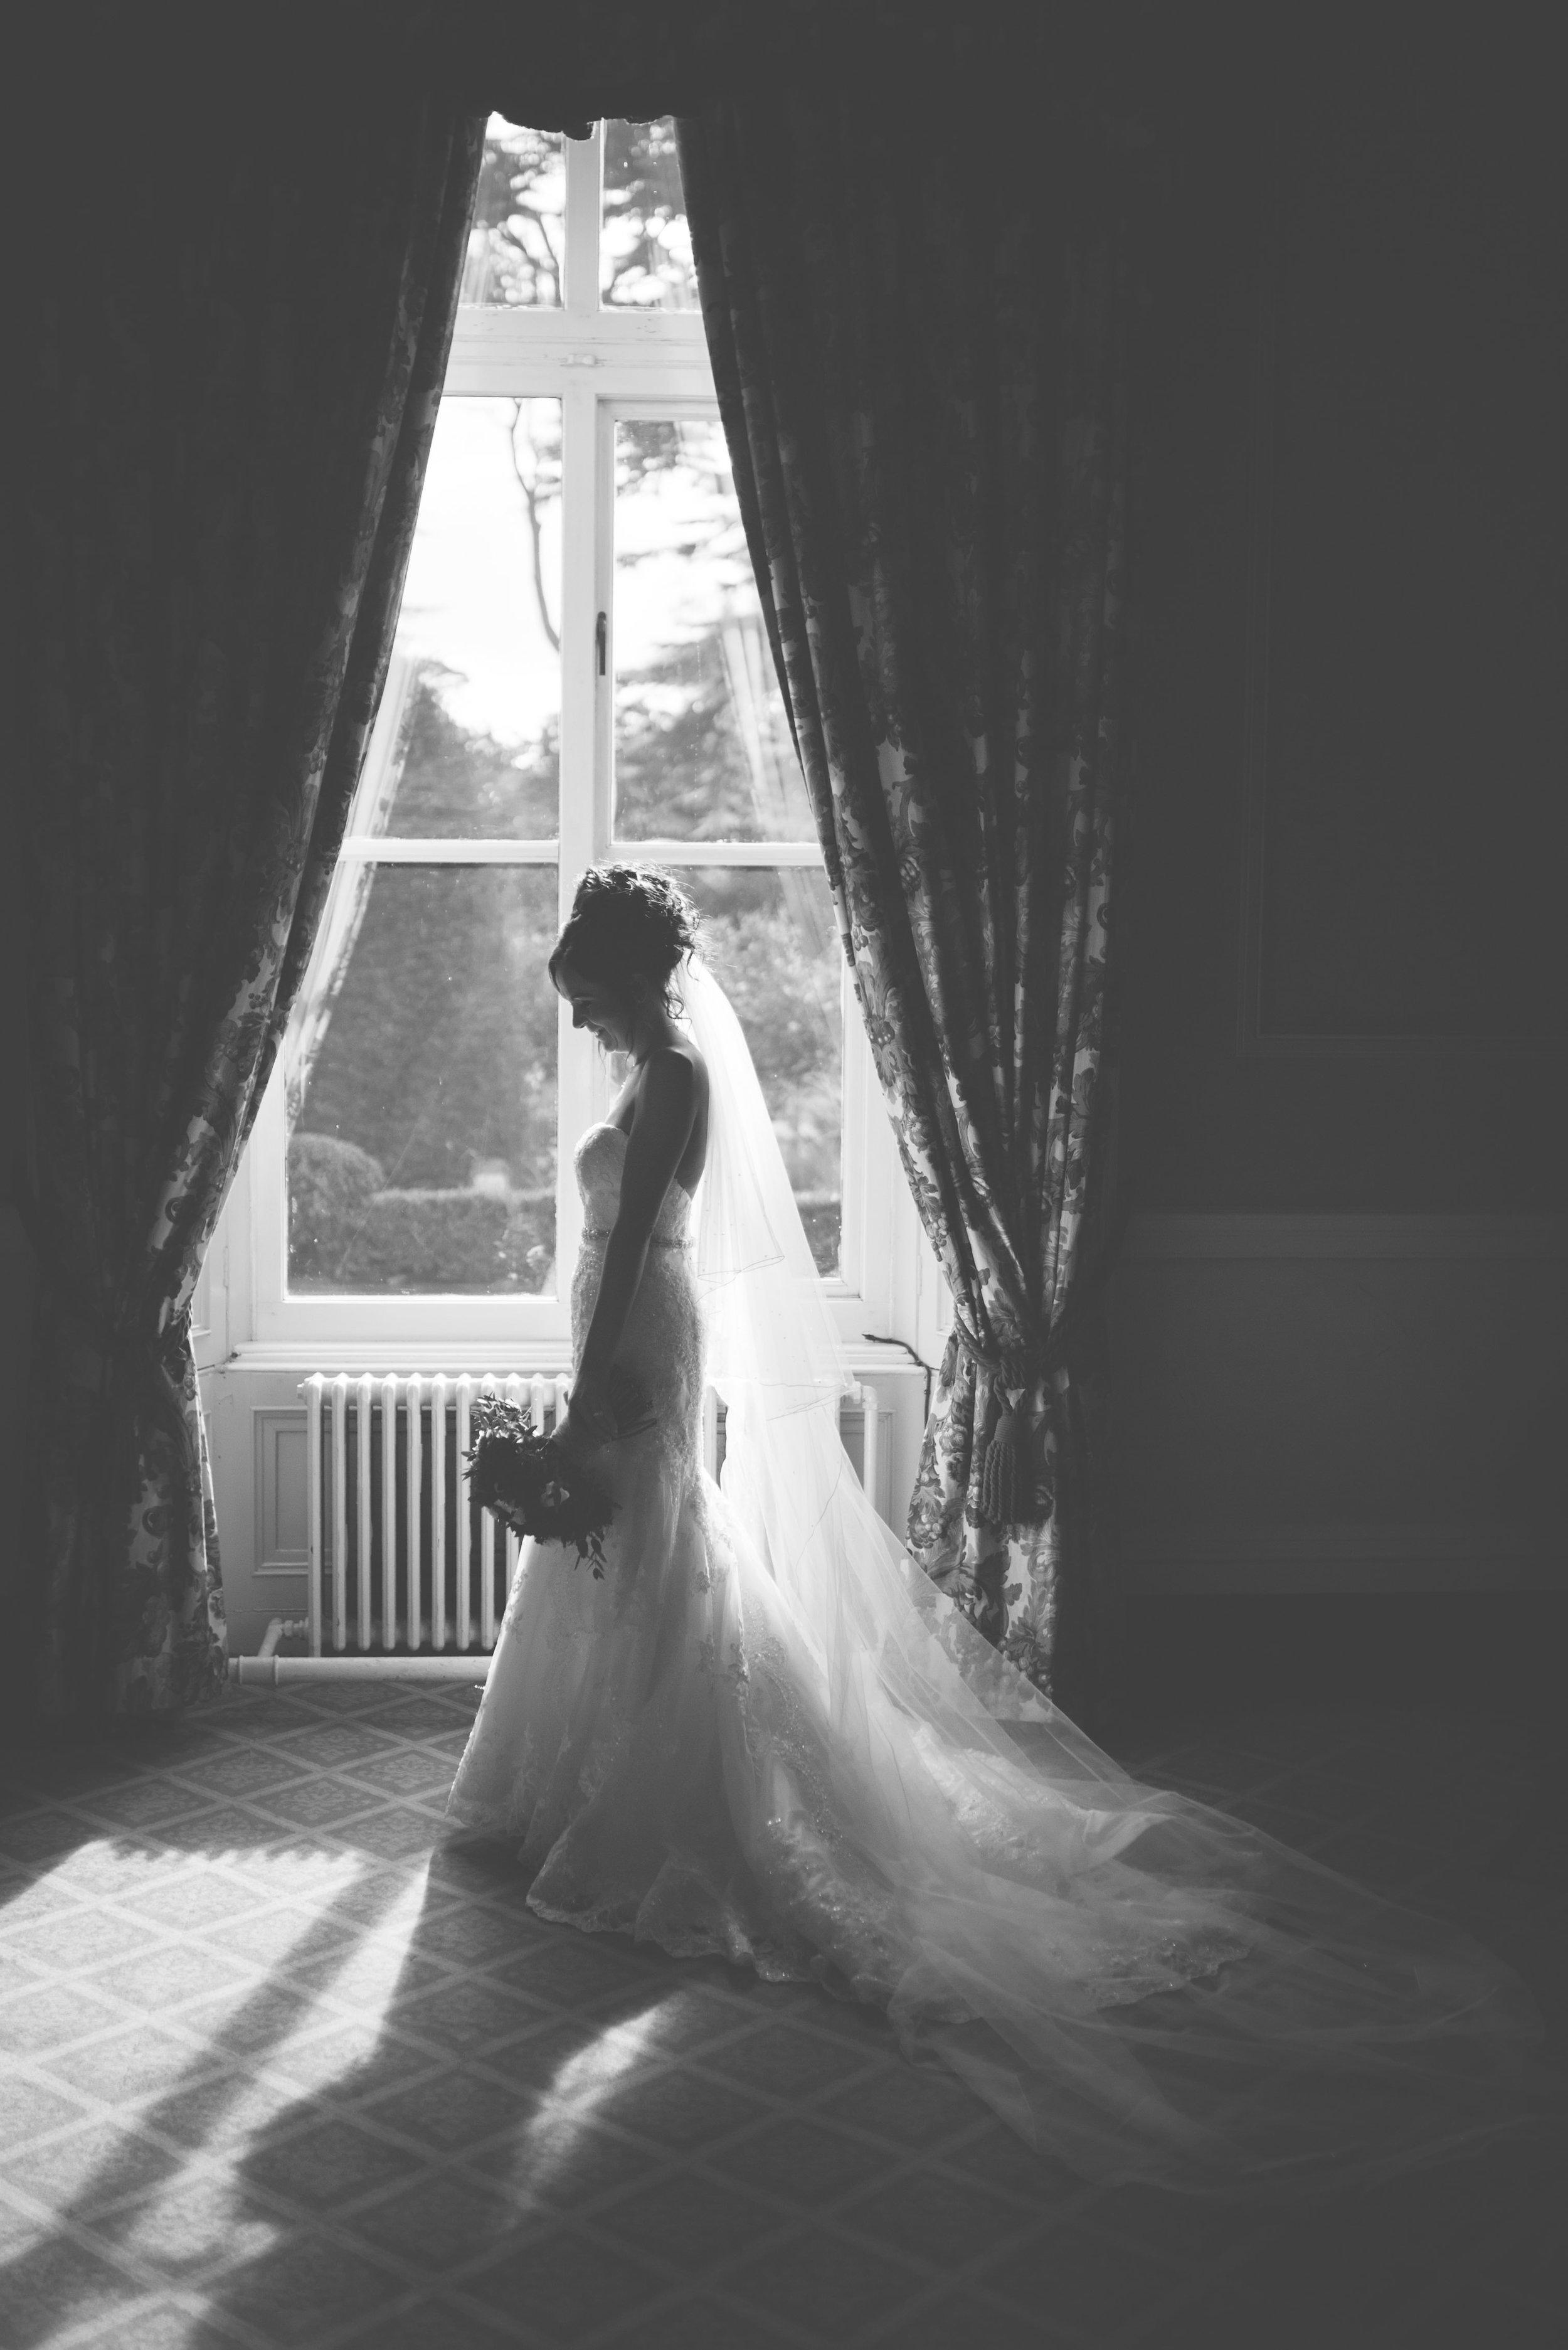 Northern Ireland Wedding Photographer | Brian McEwan Photography | Affordable Wedding Photography Throughout Antrim Down Armagh Tyrone Londonderry Derry Down Fermanagh -45.jpg